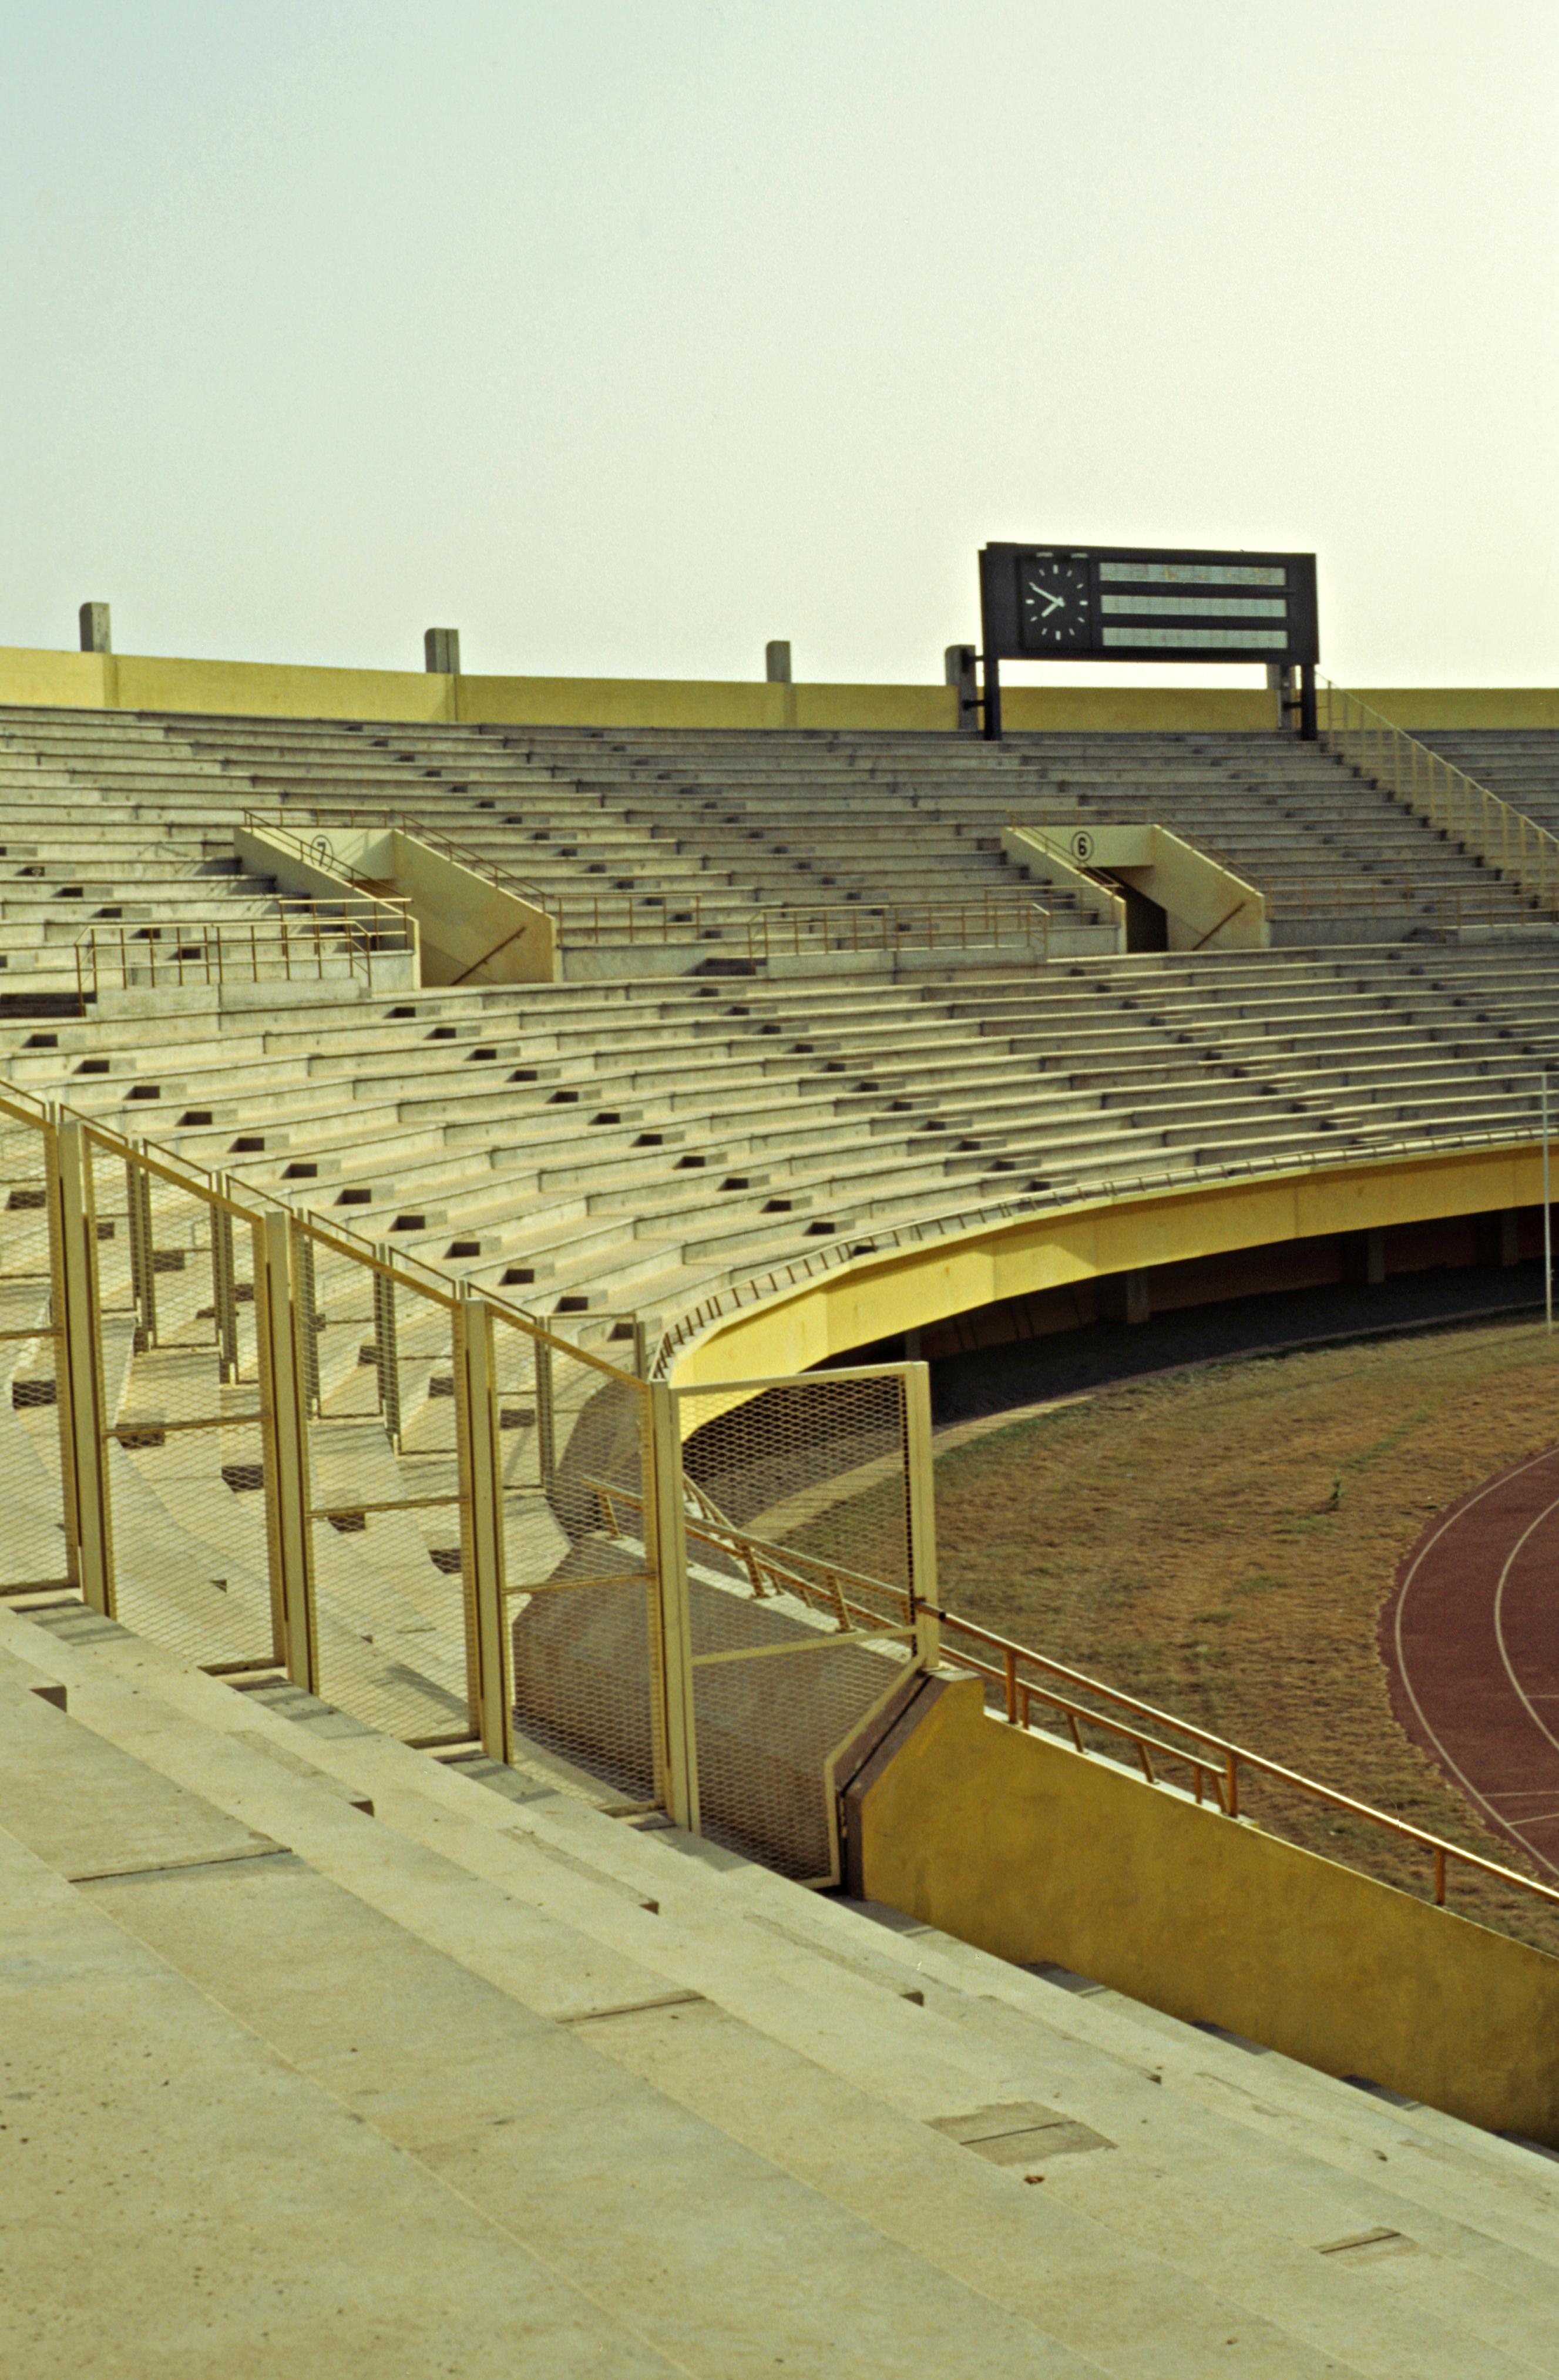 http://upload.wikimedia.org/wikipedia/commons/9/97/Stadiumbobodioulasso3.jpg